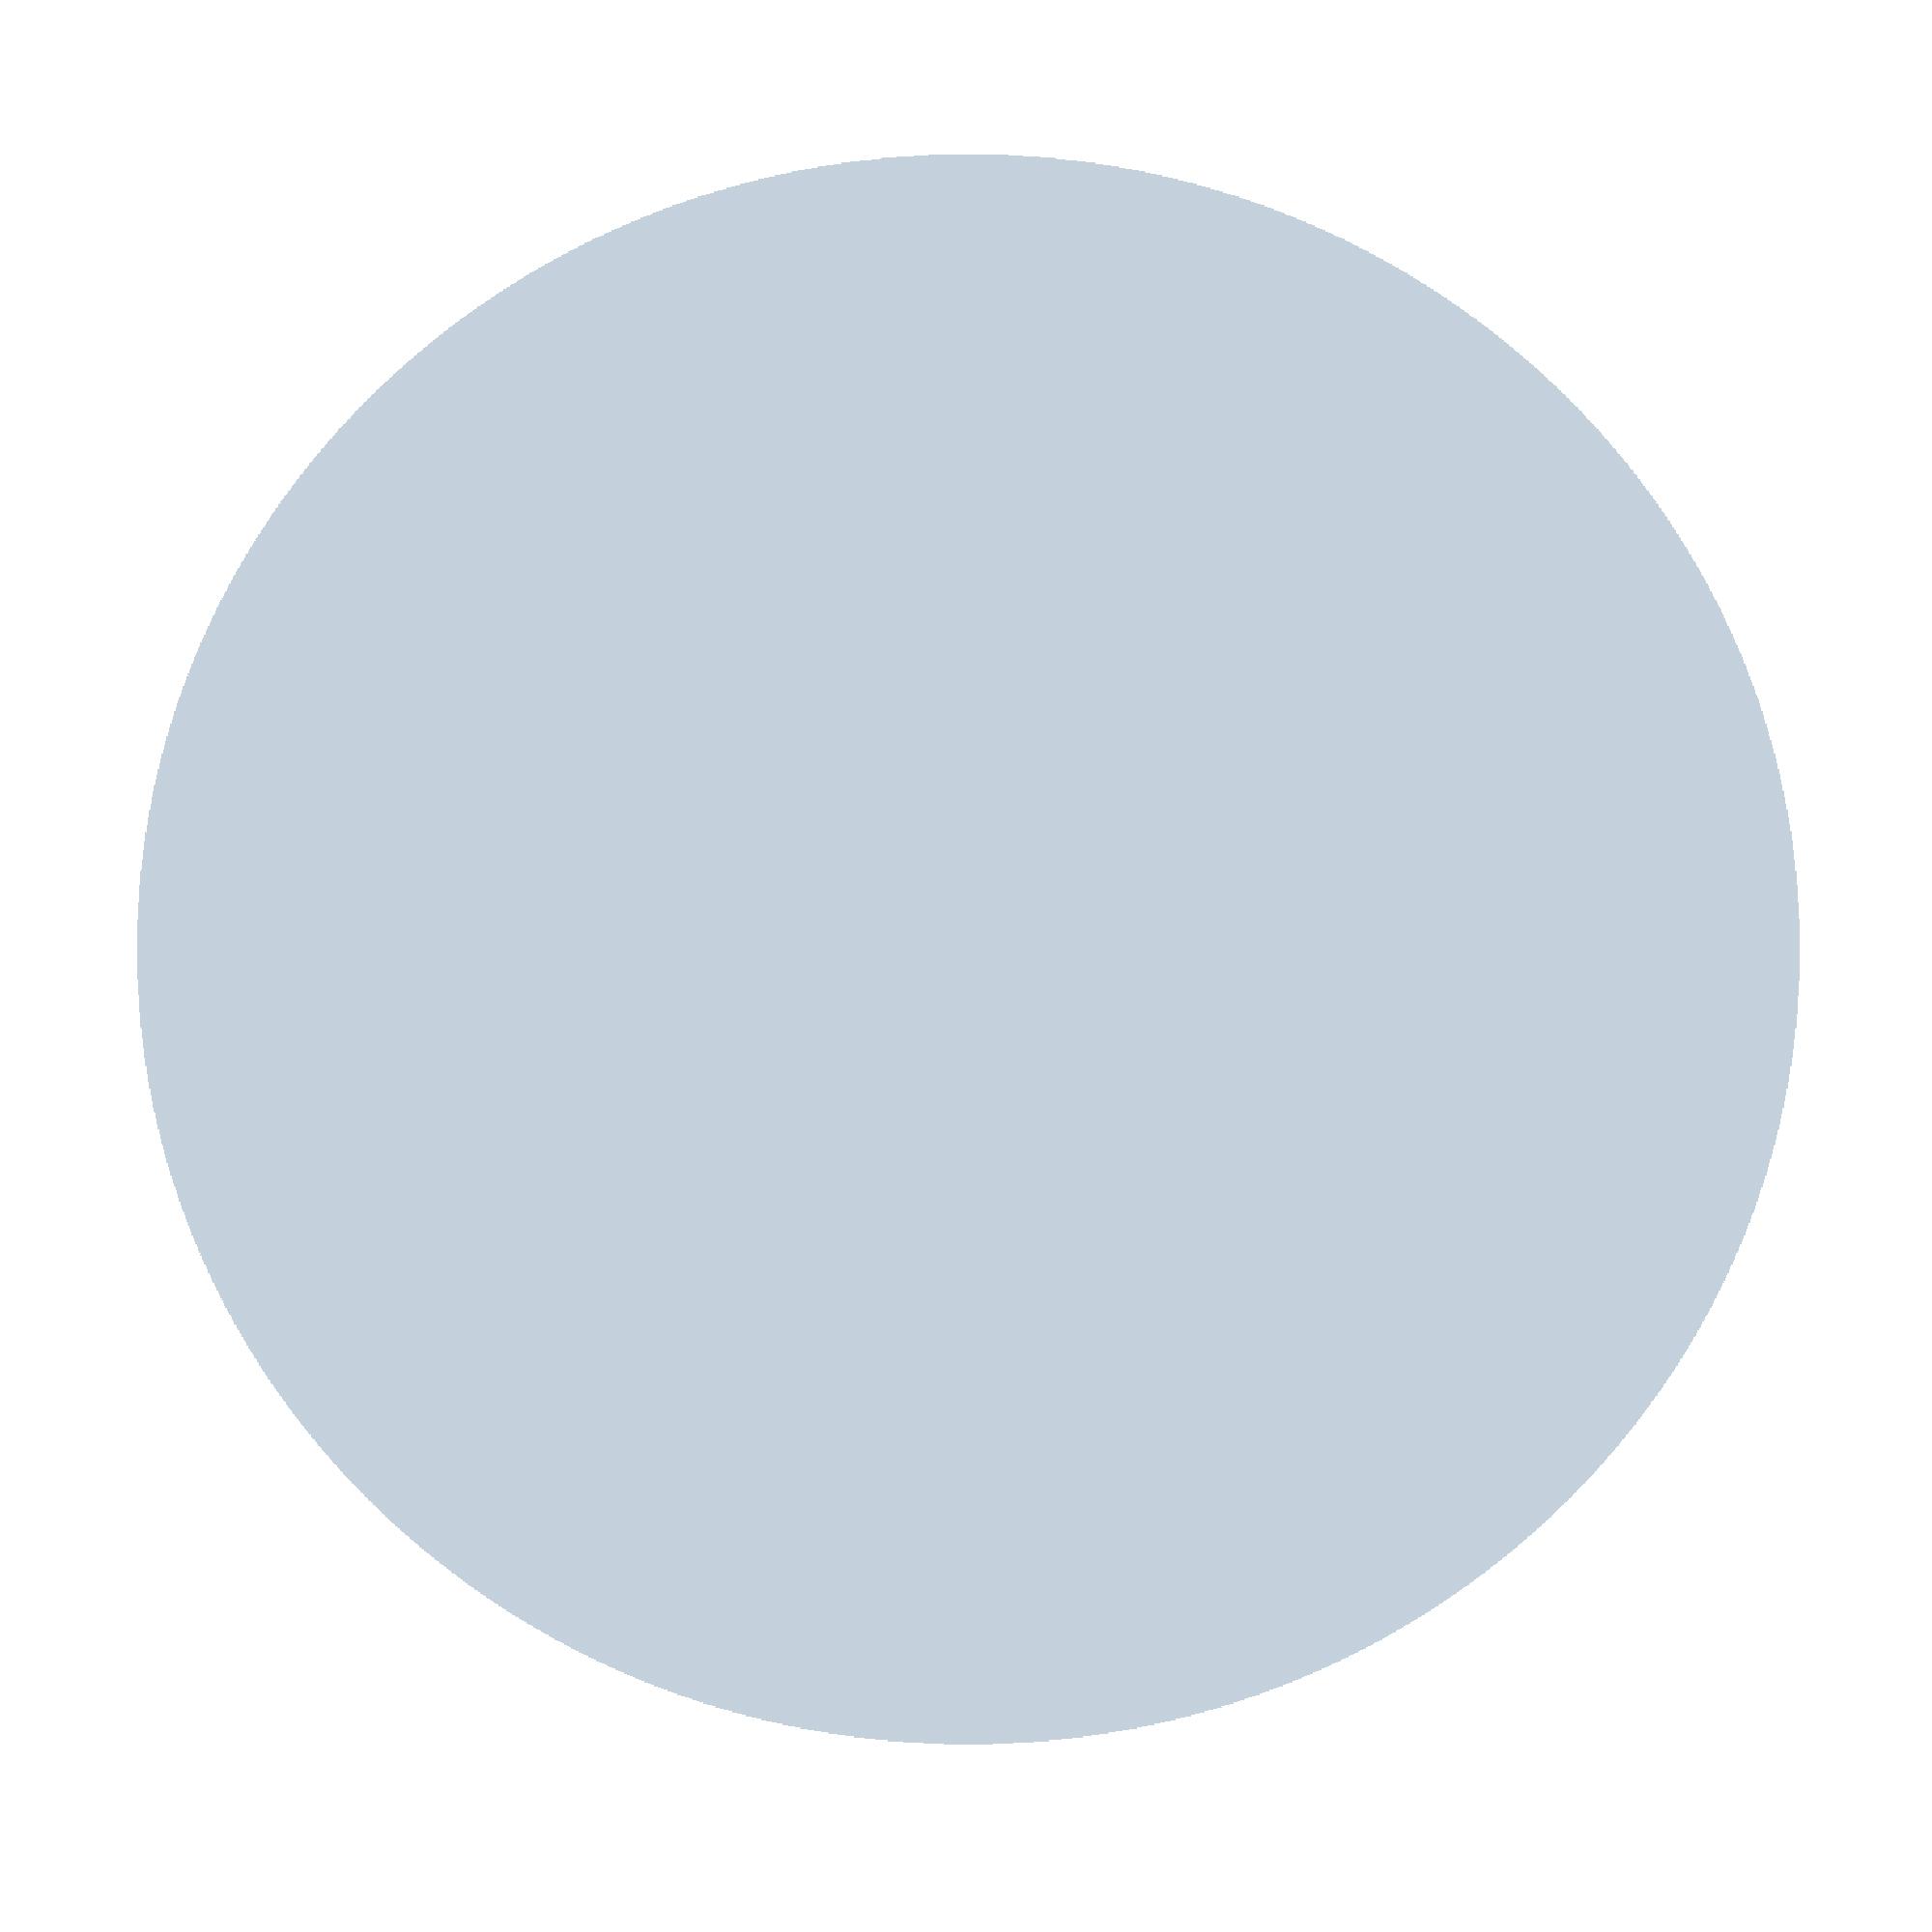 Bluey grey.jpg